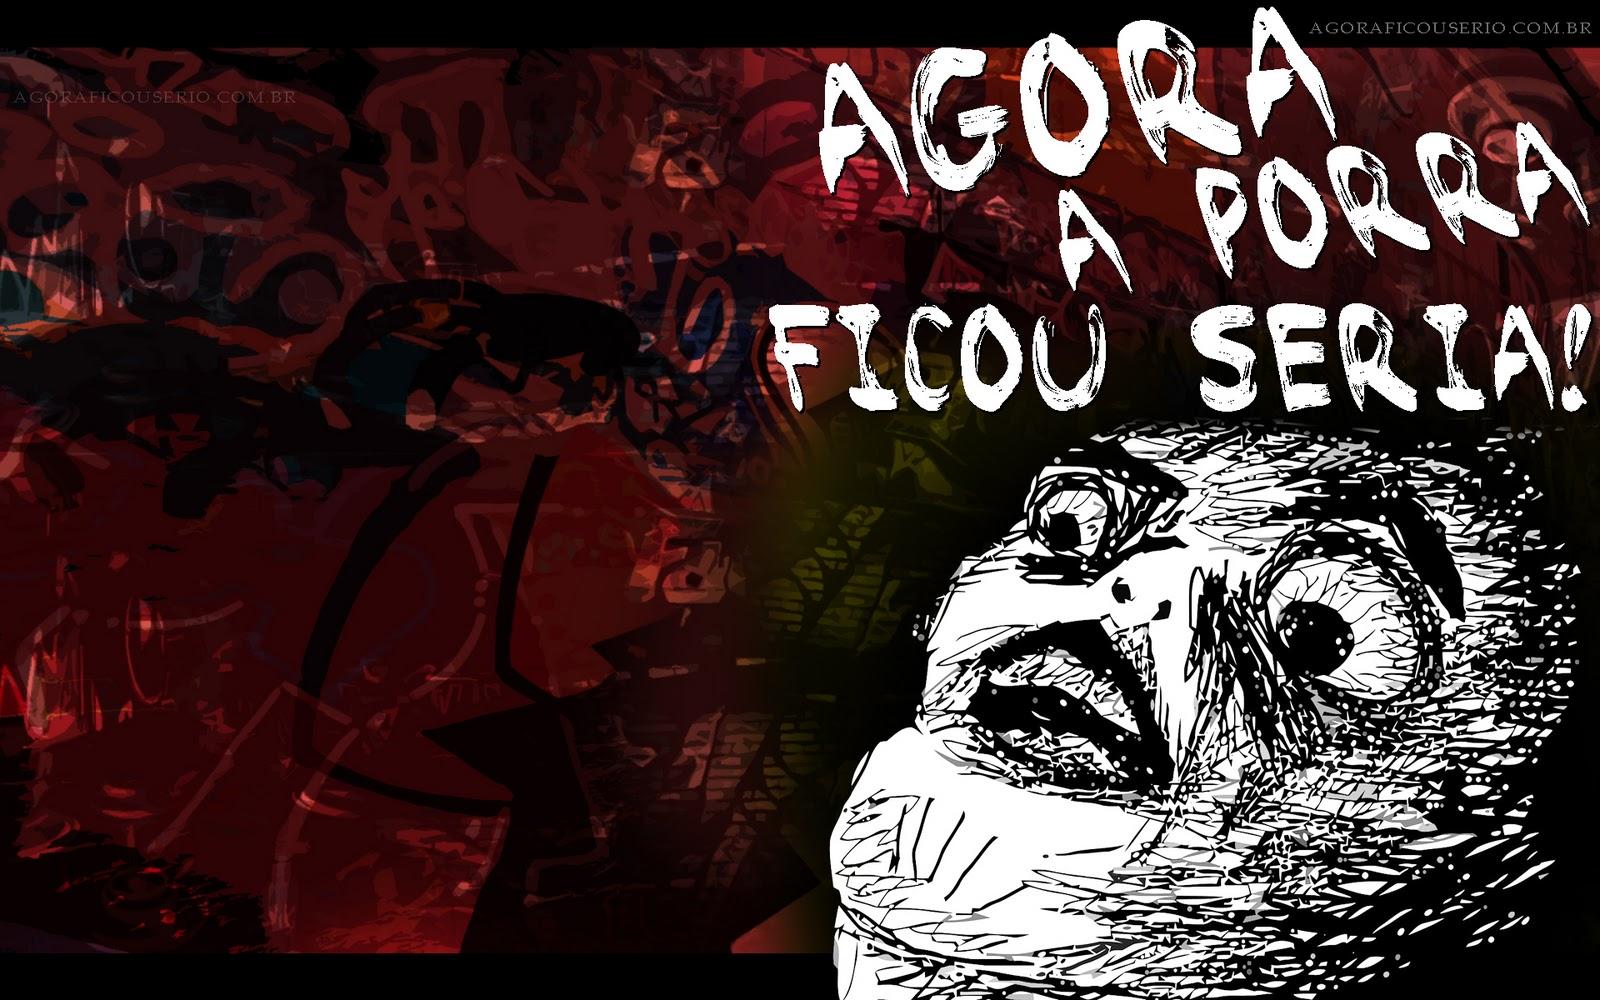 http://1.bp.blogspot.com/-U5D6sUlKqVQ/TxmlwOTcv3I/AAAAAAAAAqQ/9nx996Ke1ls/s1600/agora+a+porra+ficou+seria+wallpaper.png